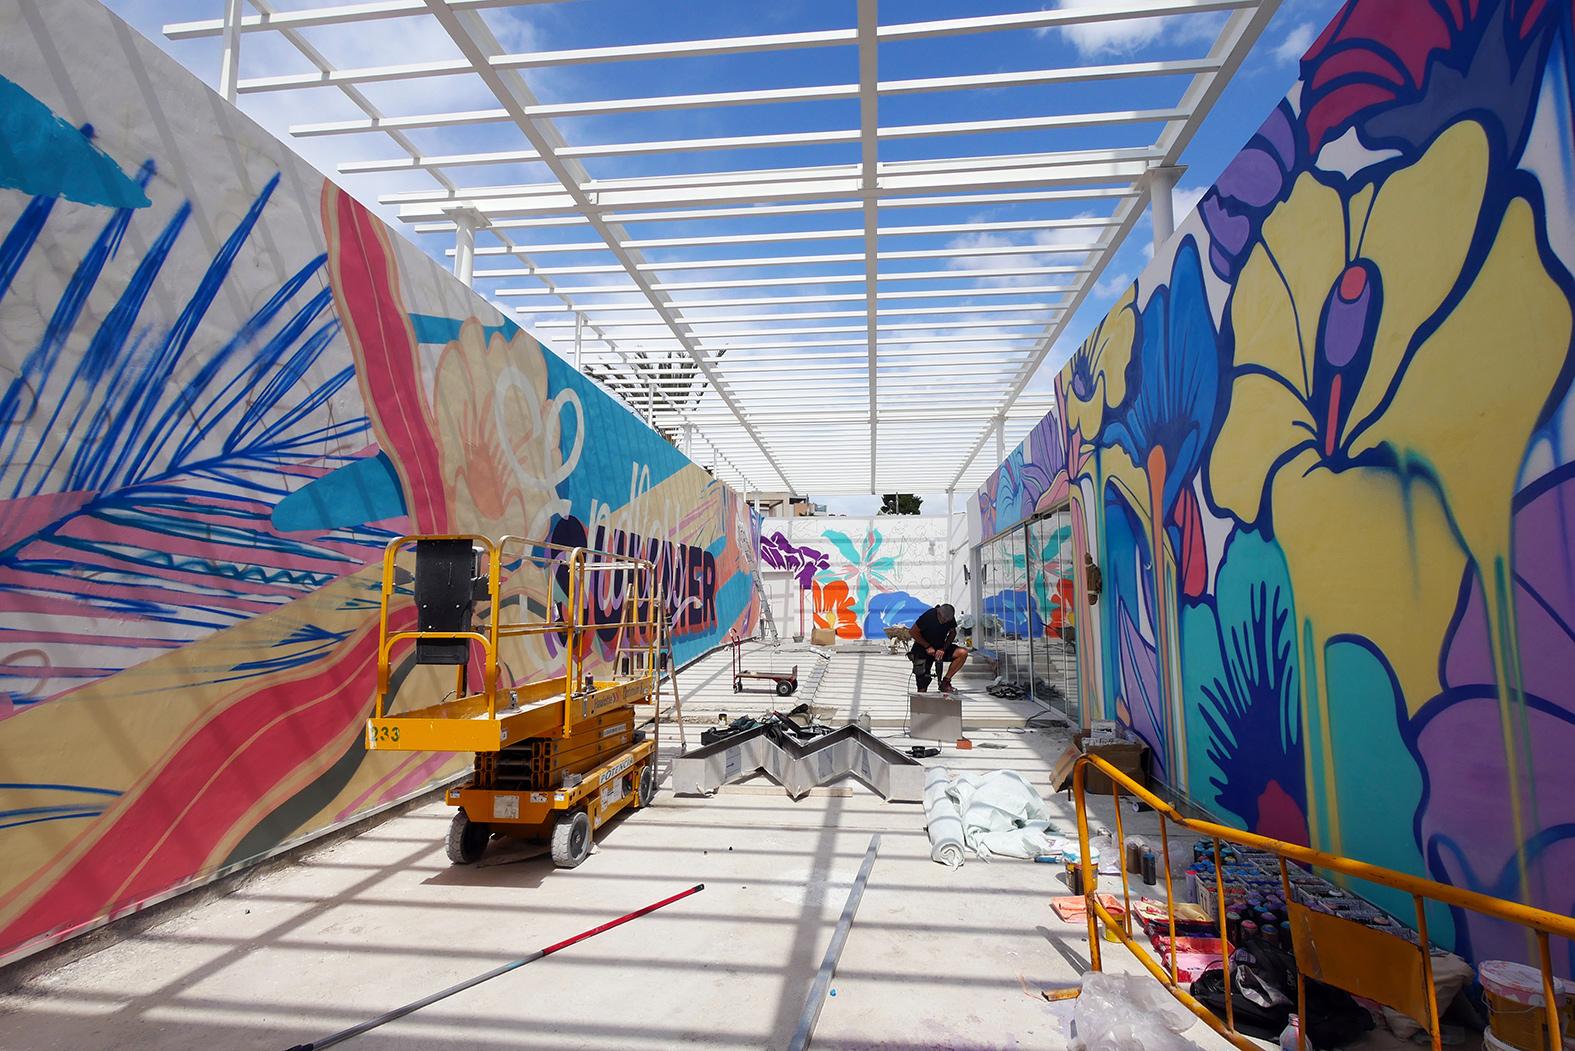 Nerone-W-hotel-painting-street-art-ibiza-14